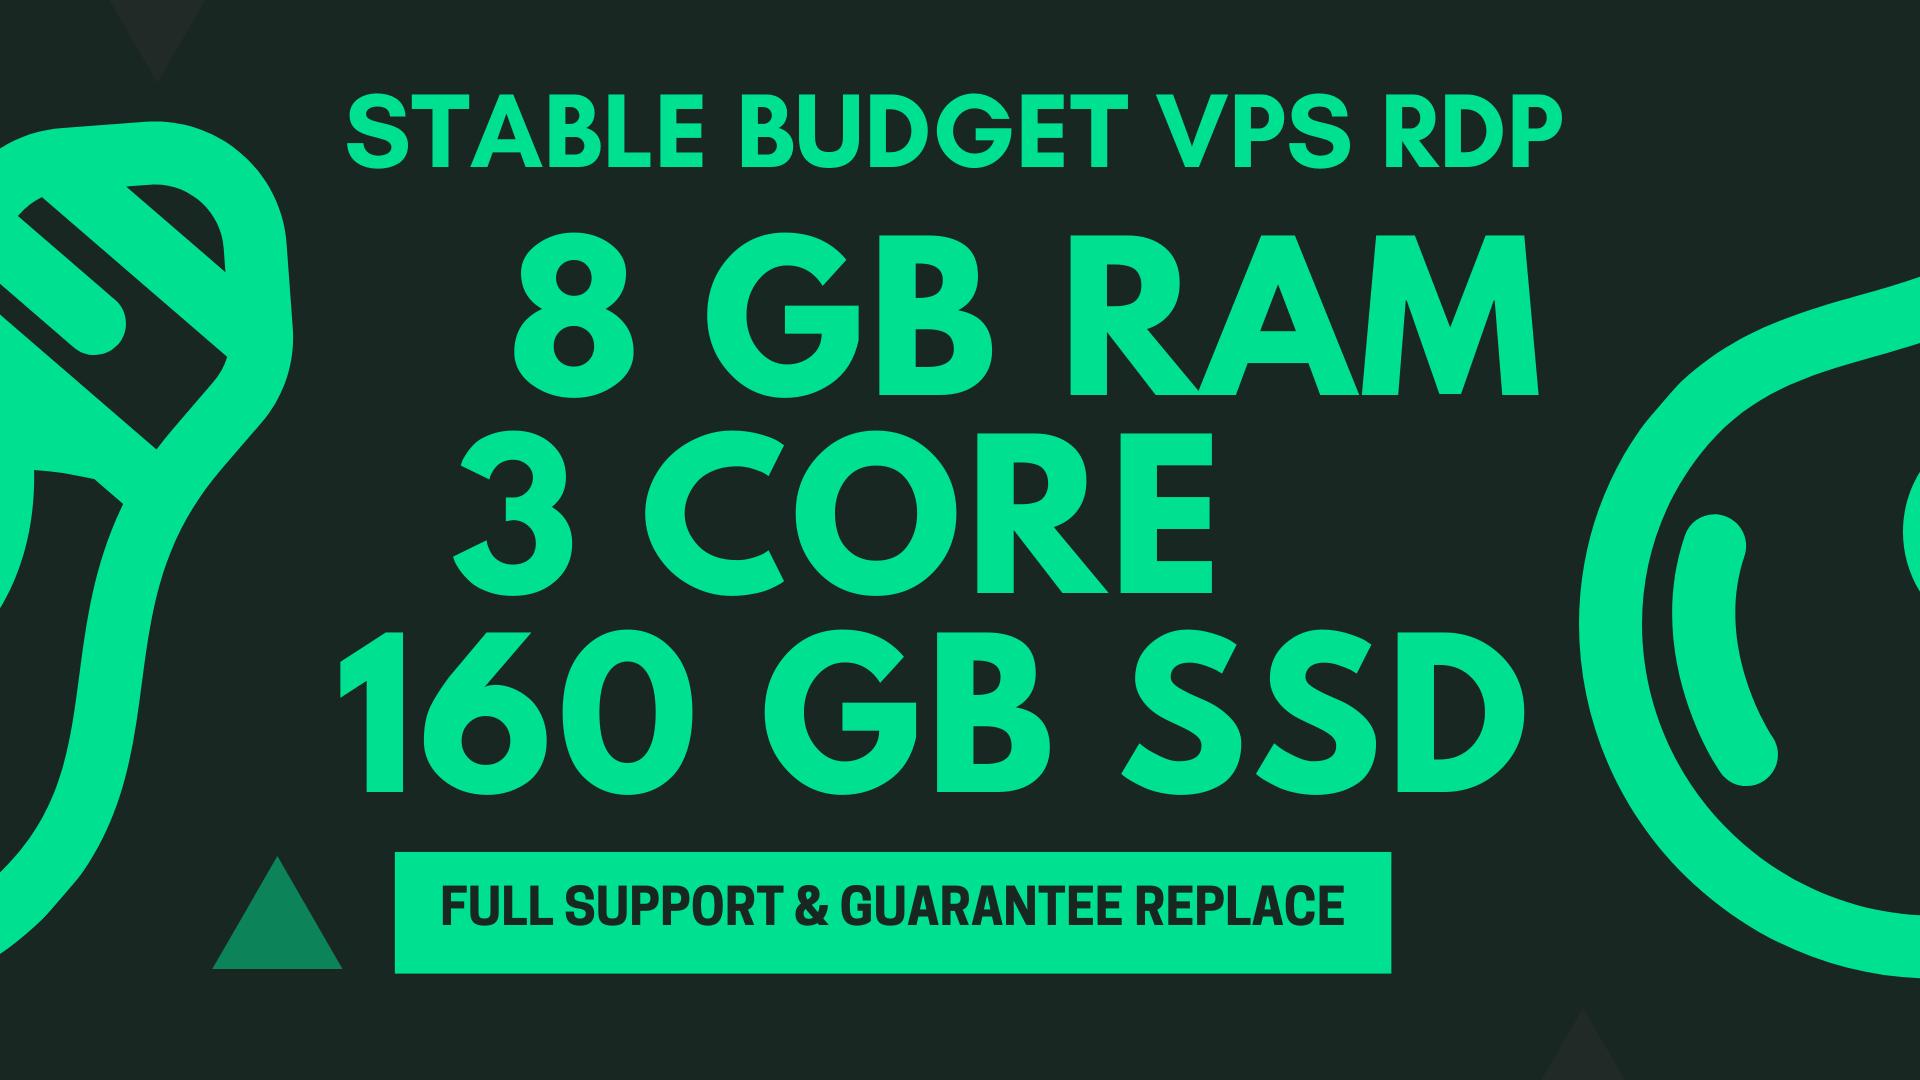 STABLE BUDGET WINDOWS RDP VPS 8GB RAM 3CORE 160GB SSD